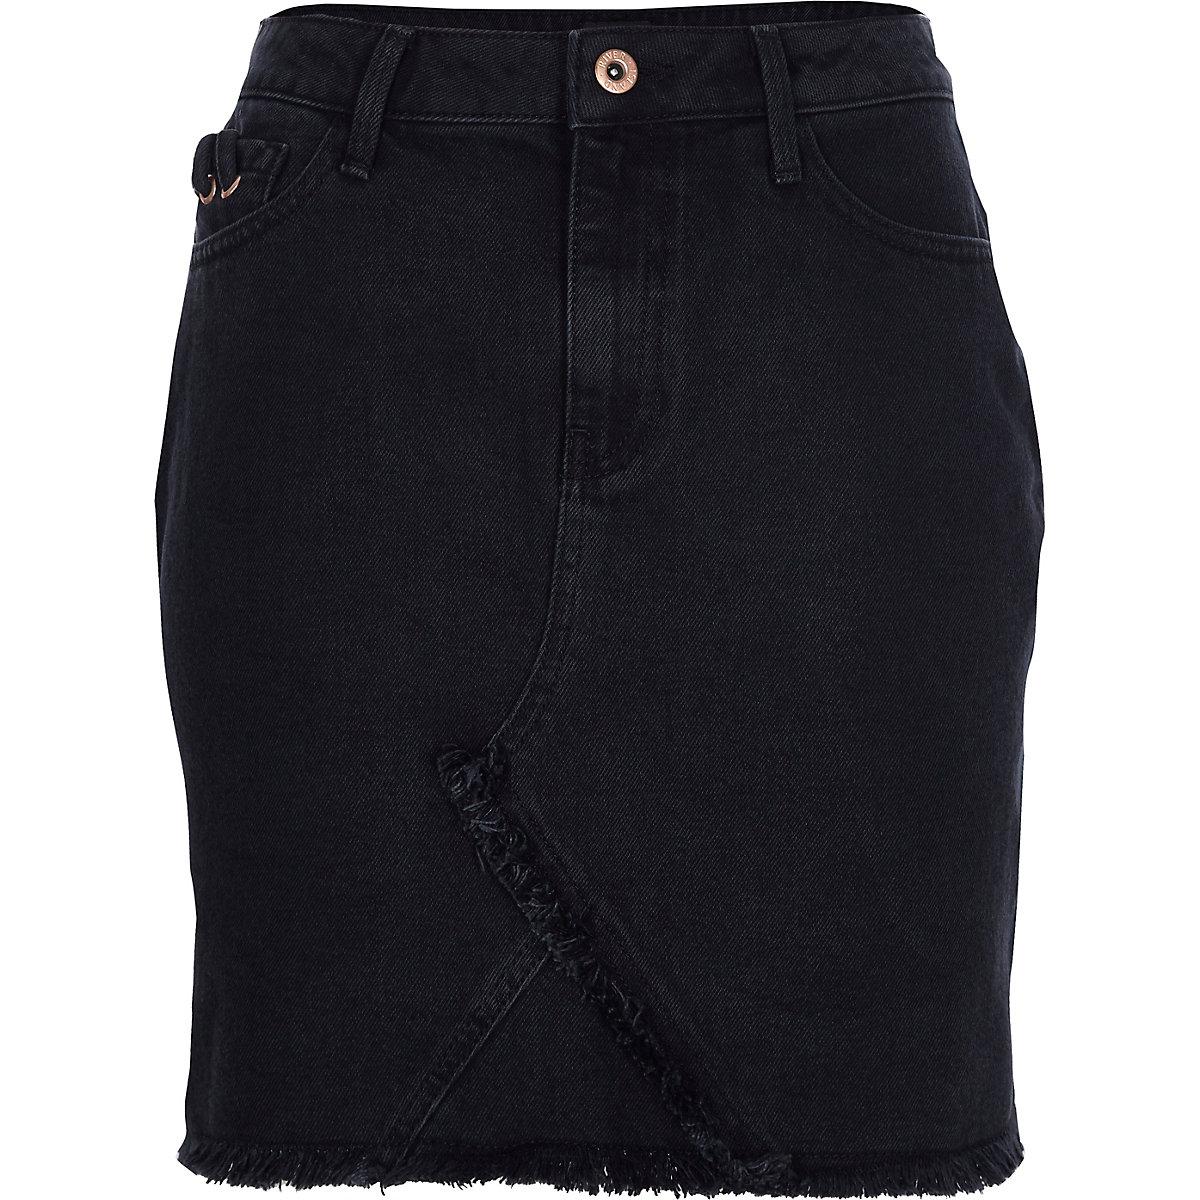 0c35e174b6c Black frayed hem denim skirt - Mini Skirts - Skirts - women